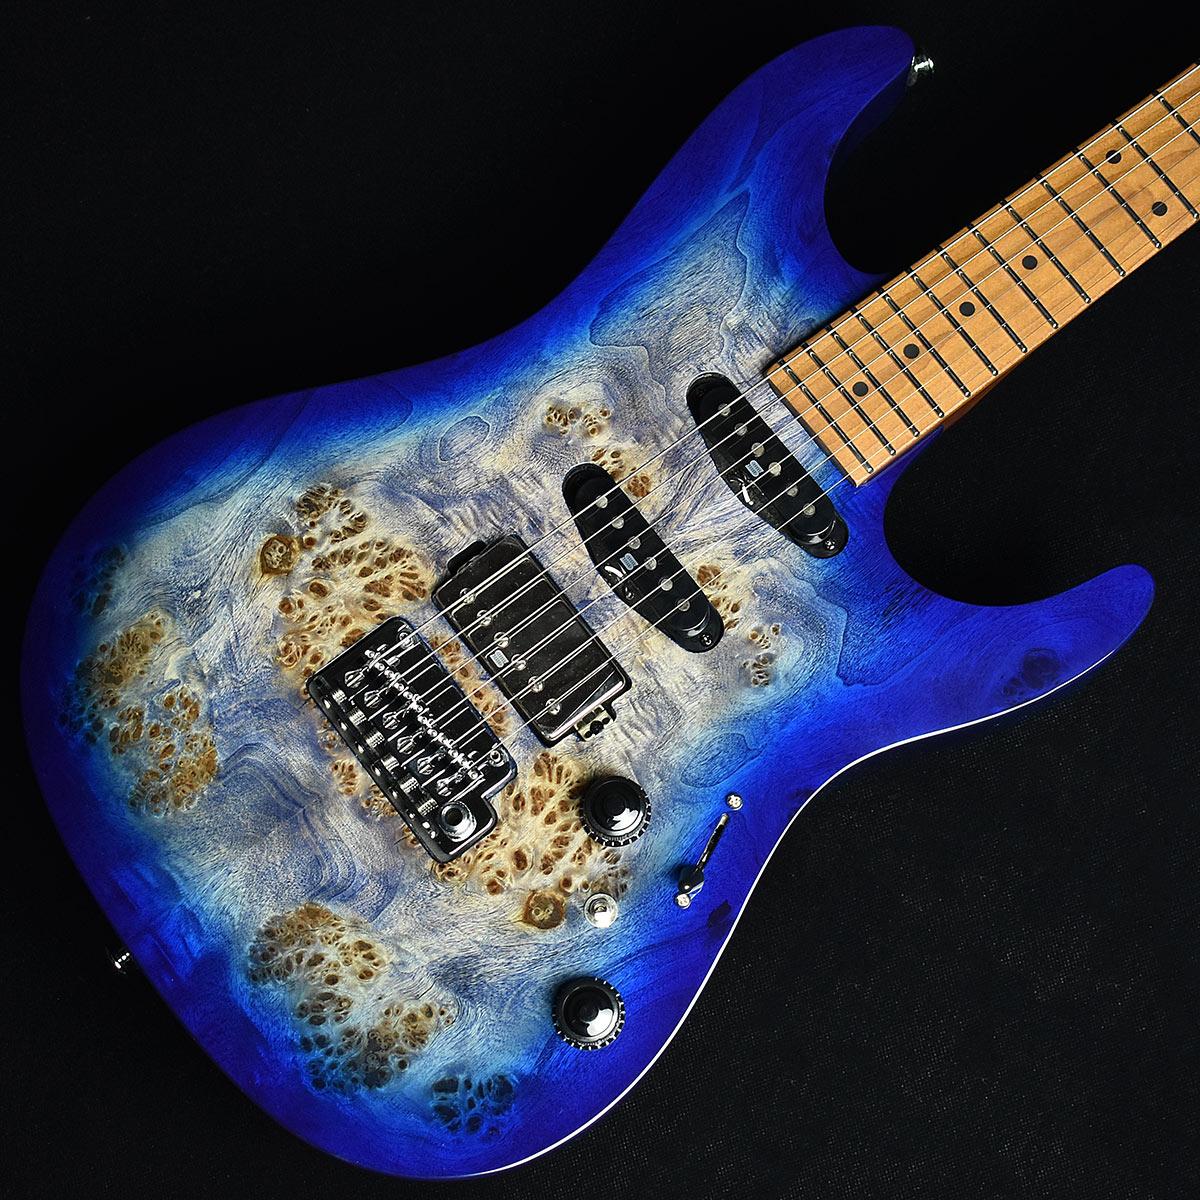 Ibanez AZ226PB Cerulean Blue Burst S/N:191211470 【アイバニーズ】【2020年限定モデル】【未展示品】